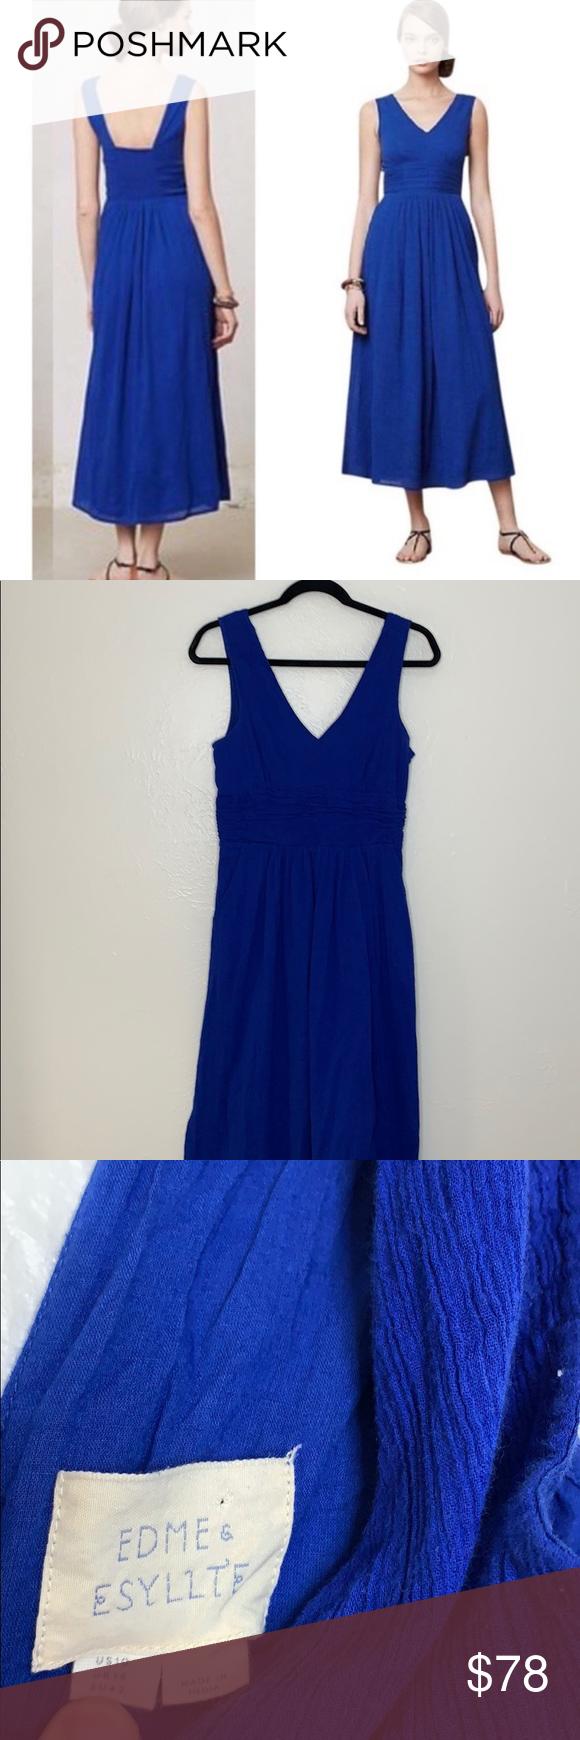 Anthropologie Esme Esyllte Blue Maxi Dress 10 Maxi Dress Blue Wedding Guest Dress Plus Size Wedding Guest Dresses [ 1740 x 580 Pixel ]